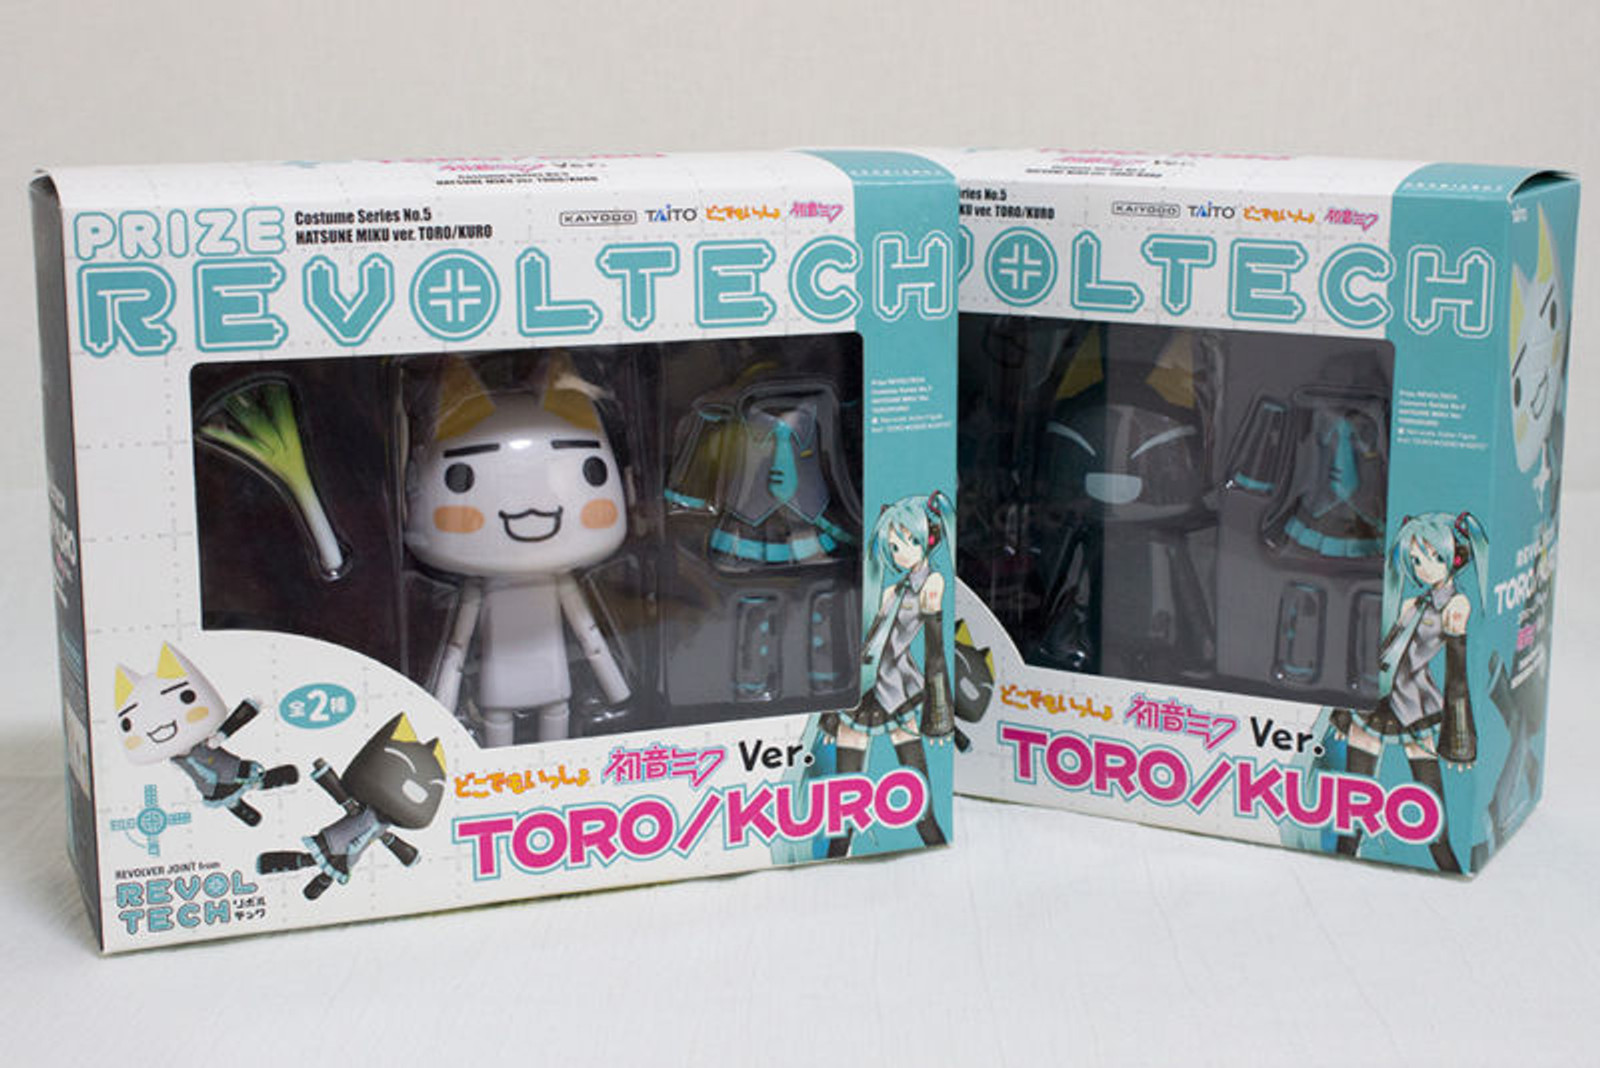 Sony Cat TORO + KURO Revoltech Miku Hatsune ver. Figure Costume 5 Doko Demo Issyo JAPAN ANIME